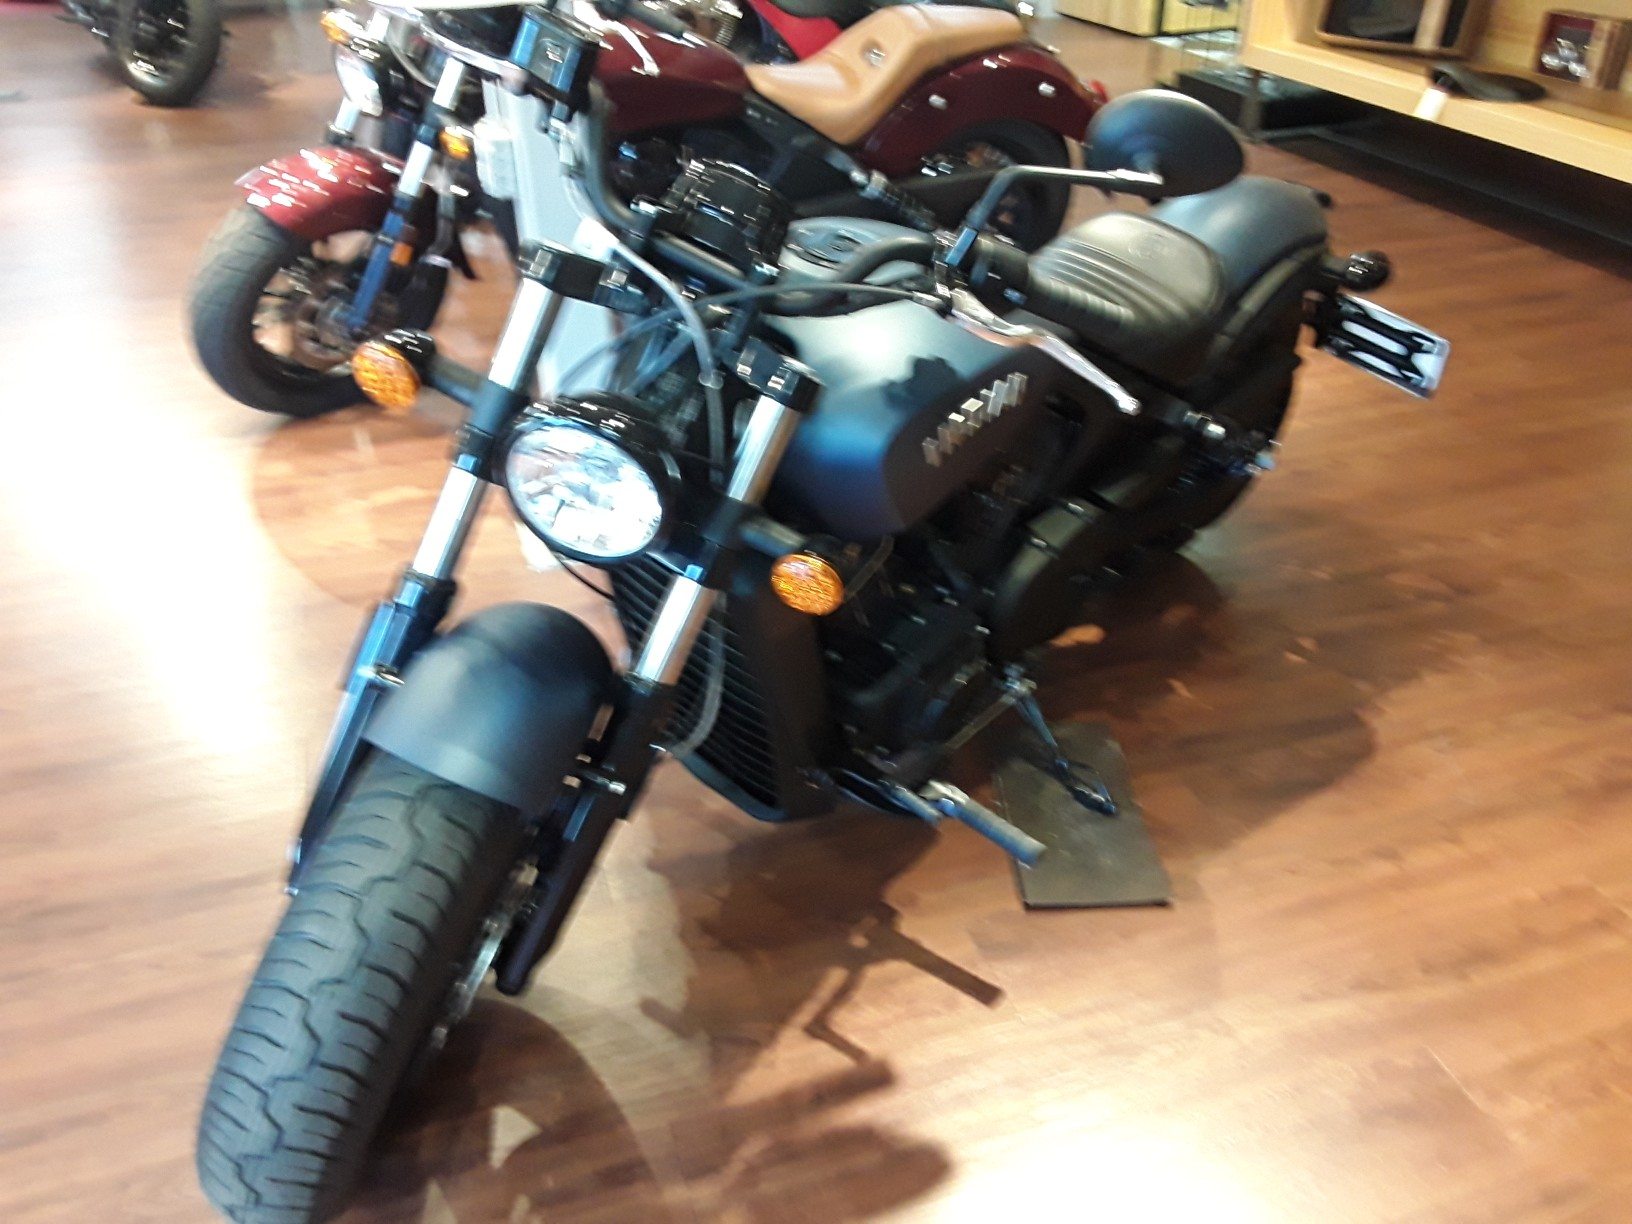 2021 Indian Motorcycle Scout Bobber Sixty Blue Slate Smoke Cal For Sale In Auburn Ca C E Auburn V Twin Inc Auburn Ca 530 885 5556